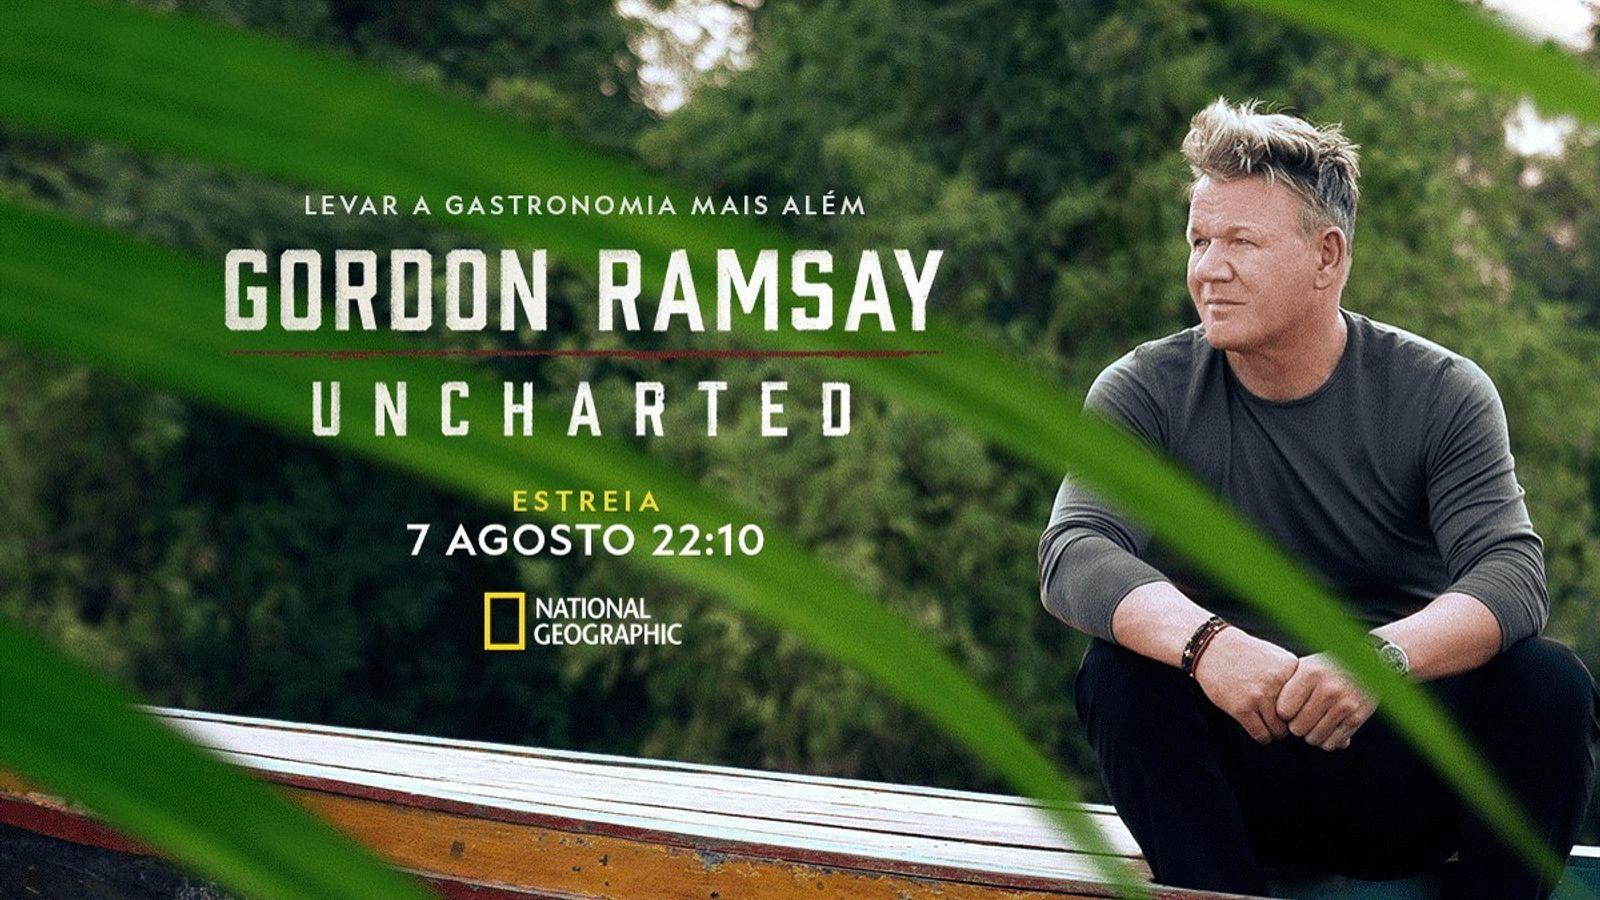 Trailer - Gordon Ramsay: Uncharted